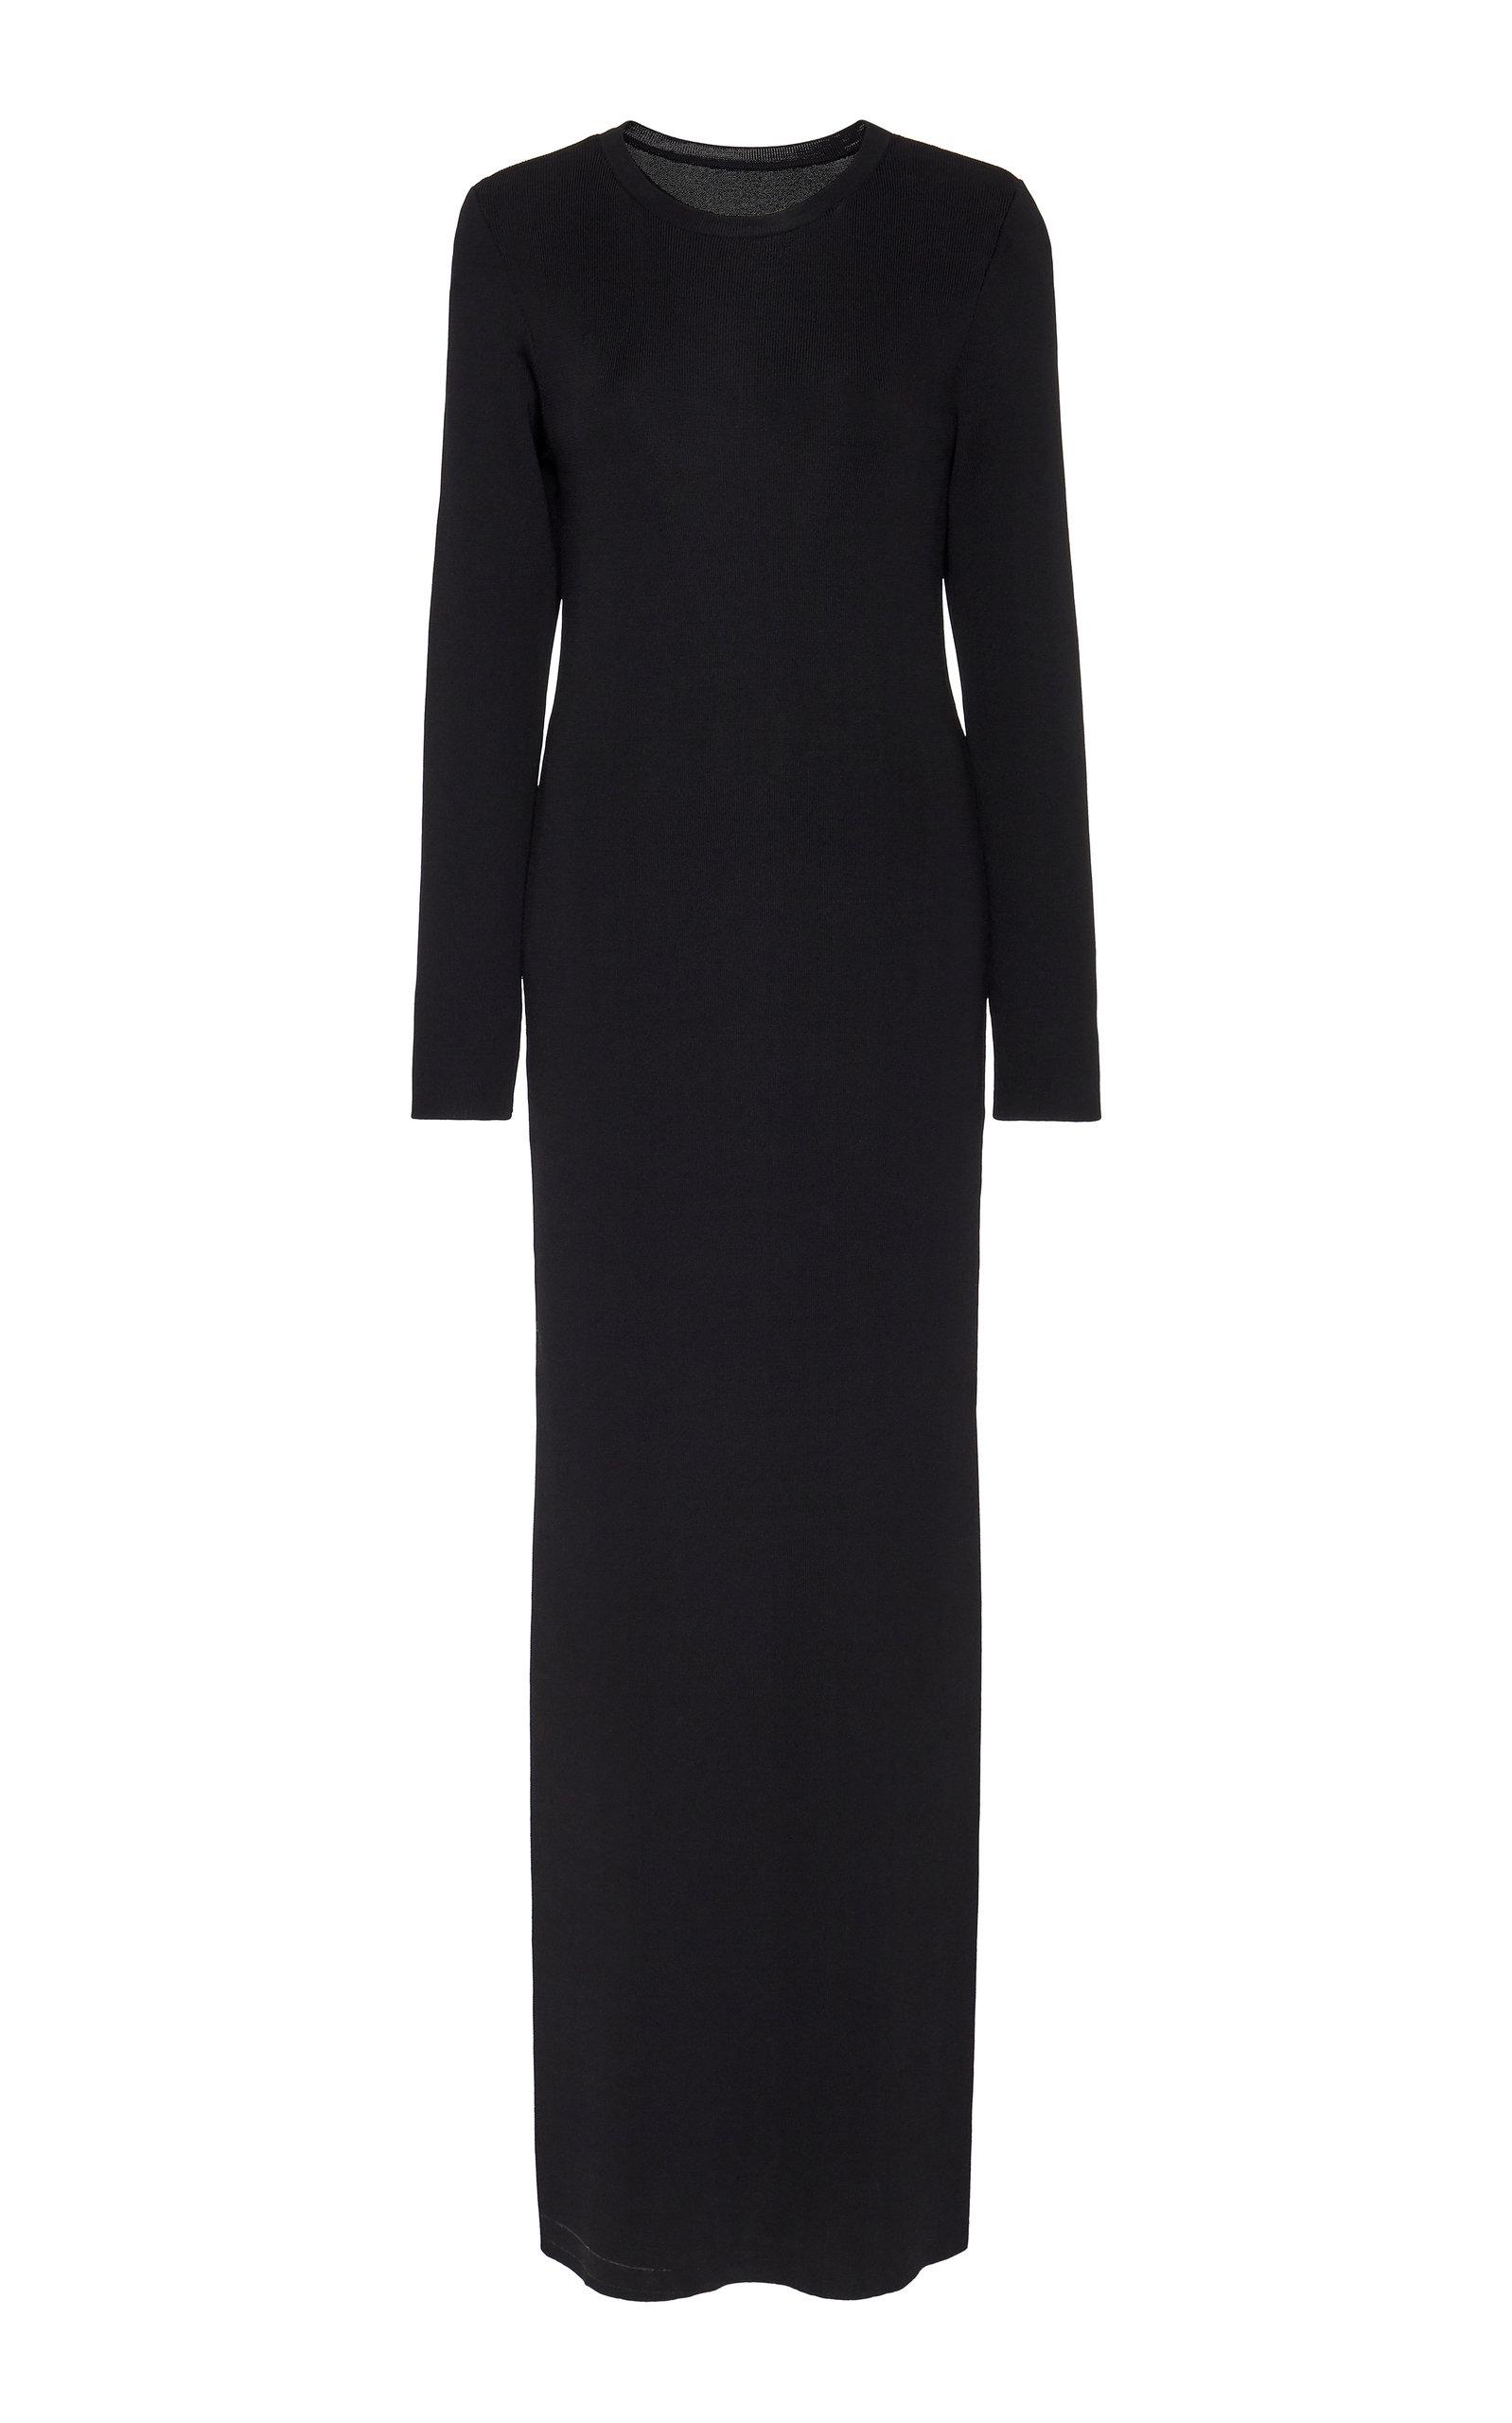 Buy Matteau Jersey Maxi Dress online, shop Matteau at the best price